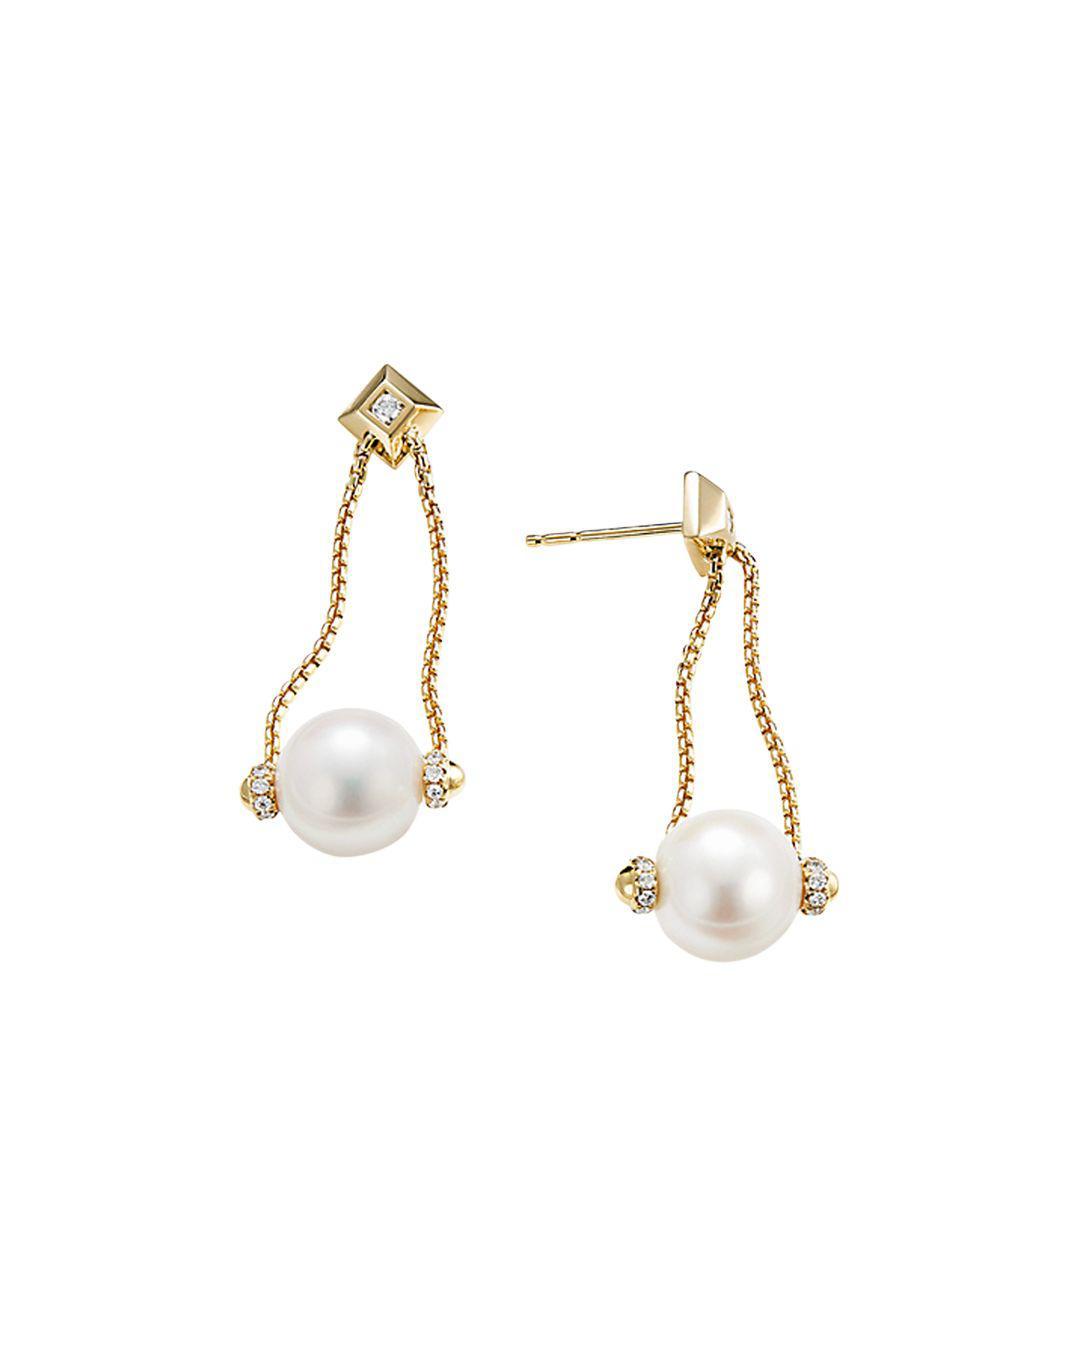 bb46decc277f2 Lyst - David Yurman Solari Pearl Drop Earring With Diamonds In 18k ...